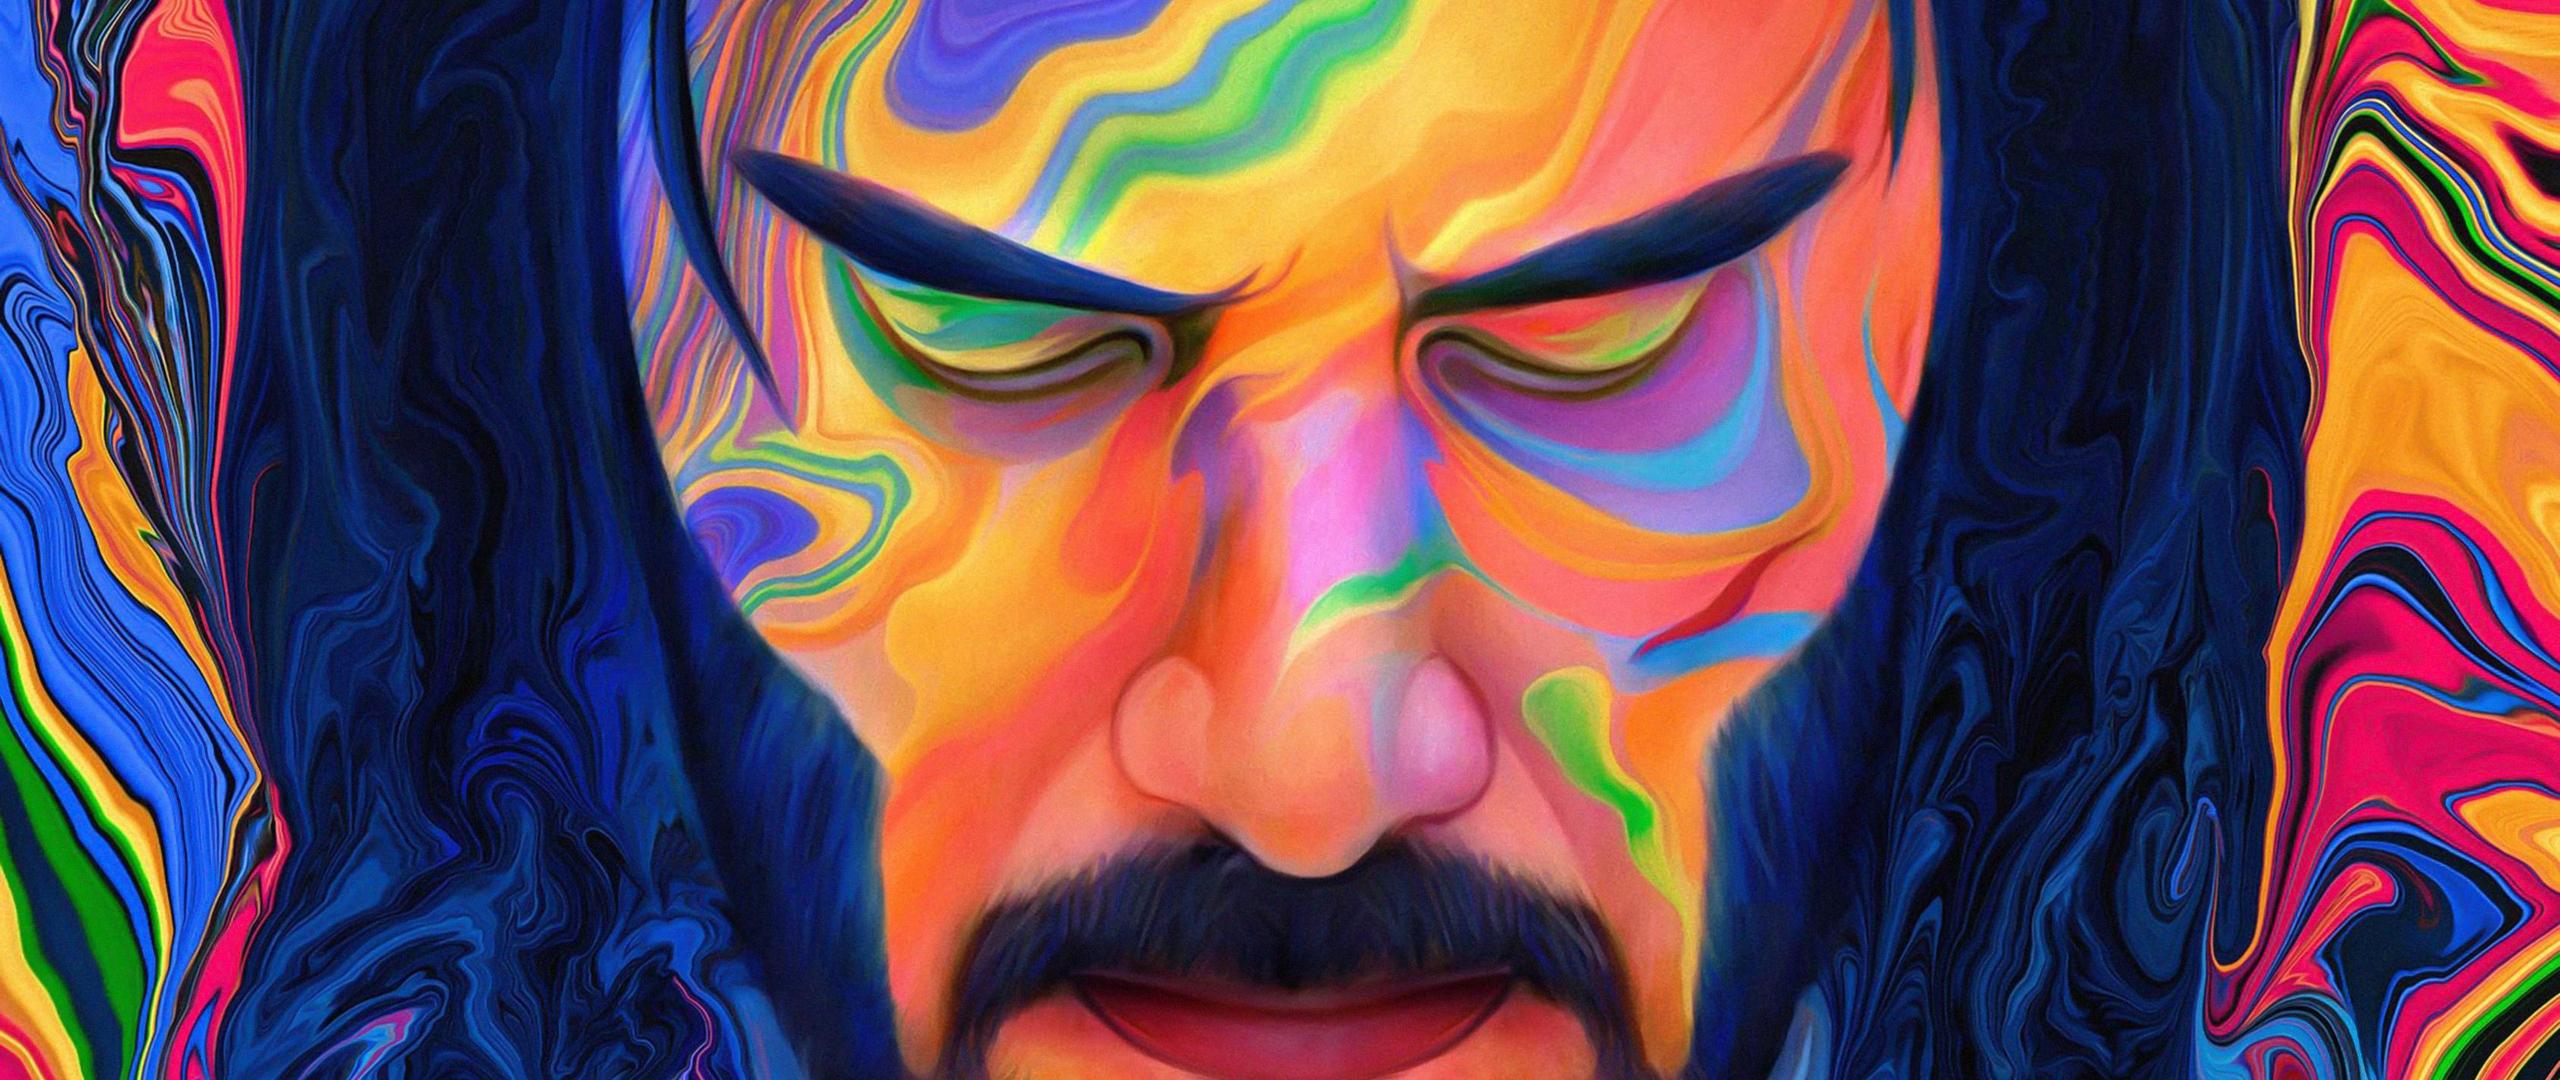 john-wick-3-colorful-art-if.jpg